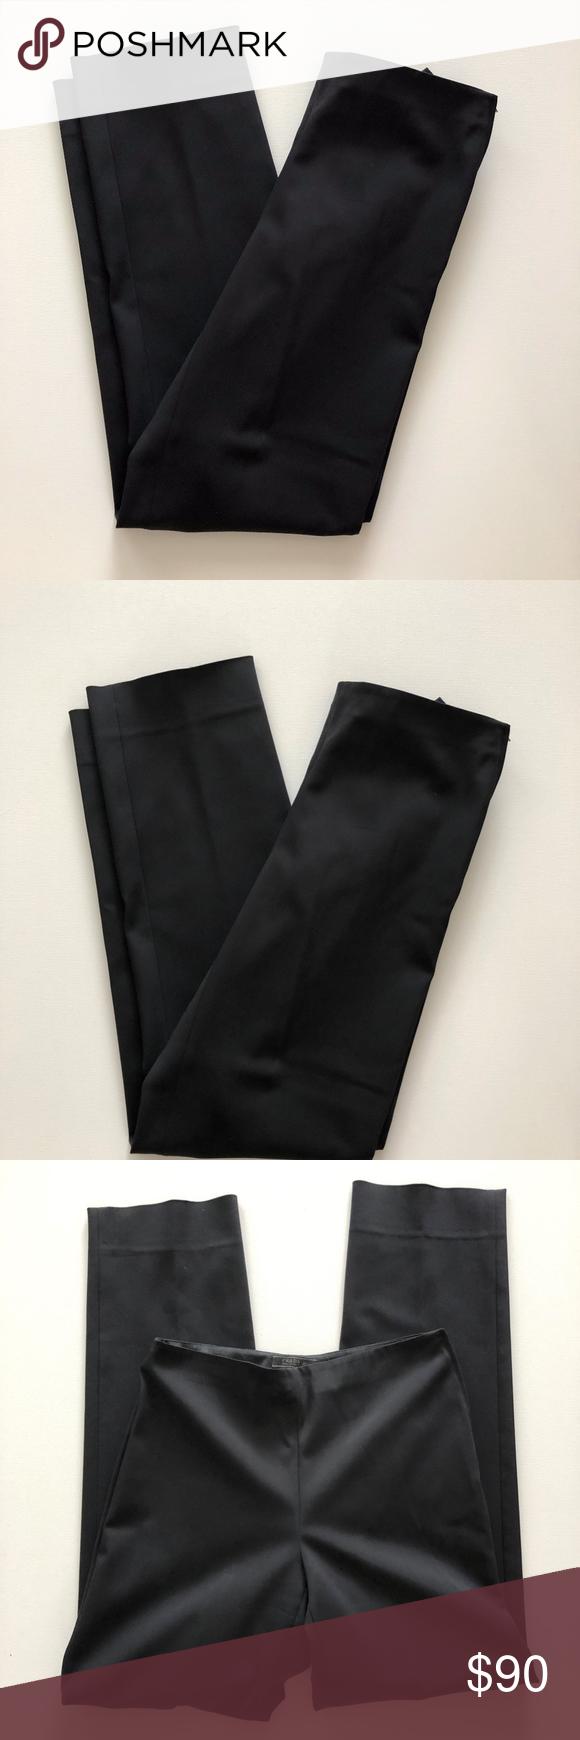 ade8230633642 Prada Classic Black Dressy Pants Size 42/4 * Classic black pants ...